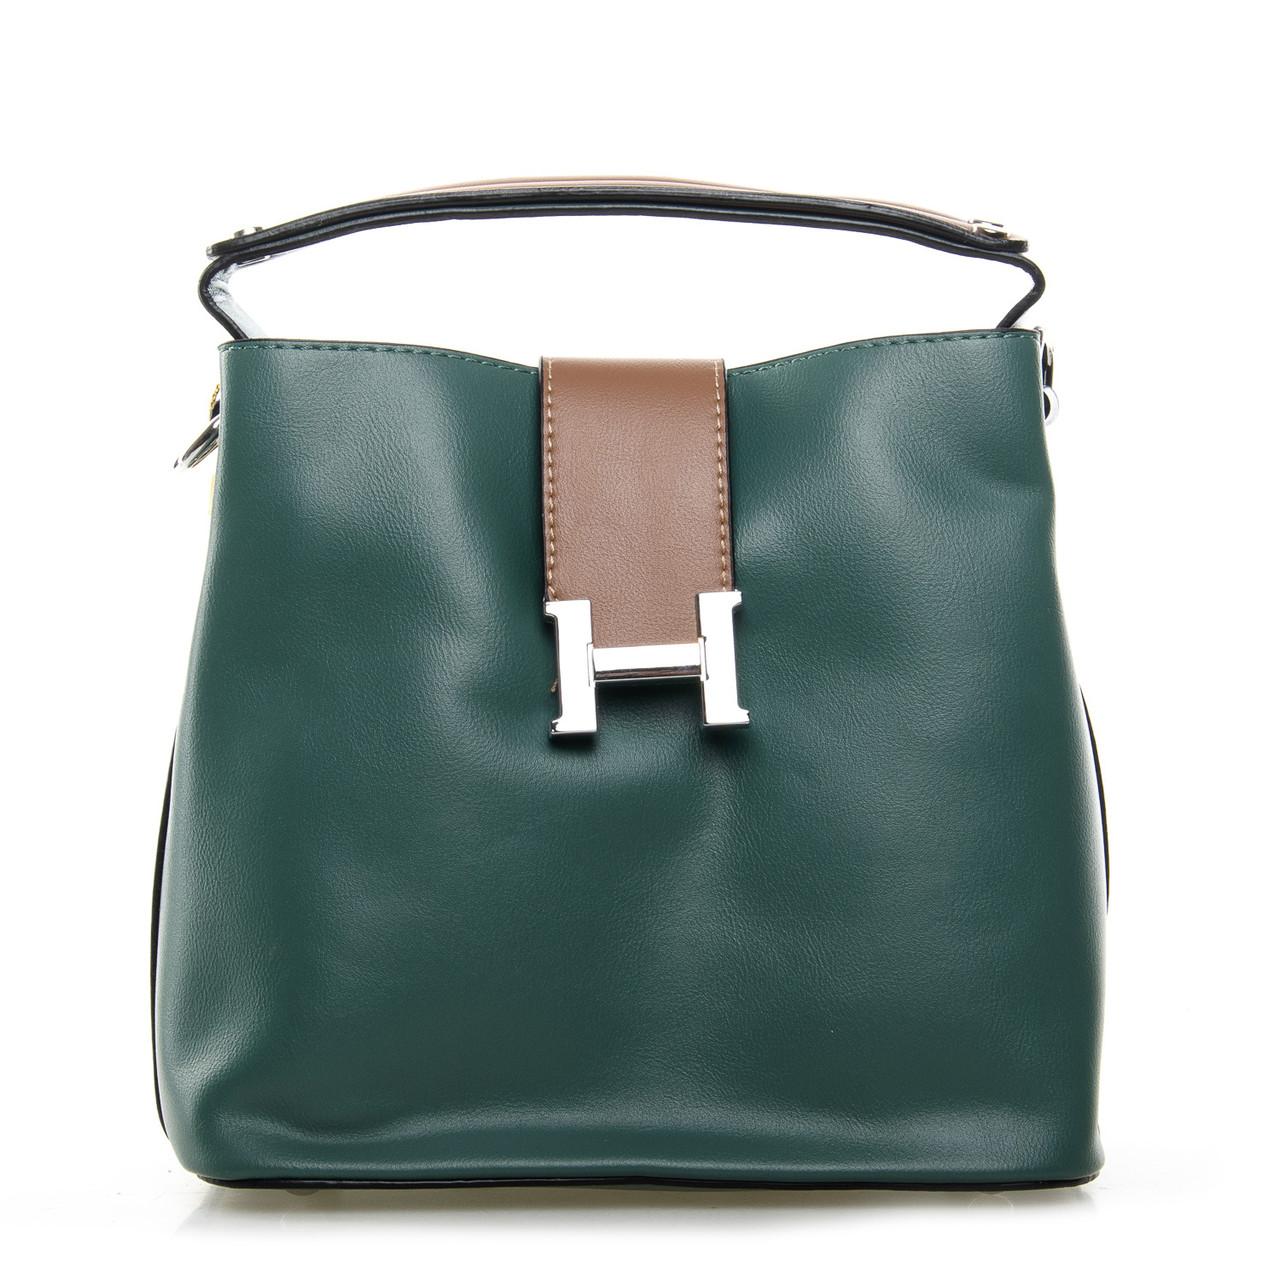 Женская сумочка иск.кожа FASHION опт/розница